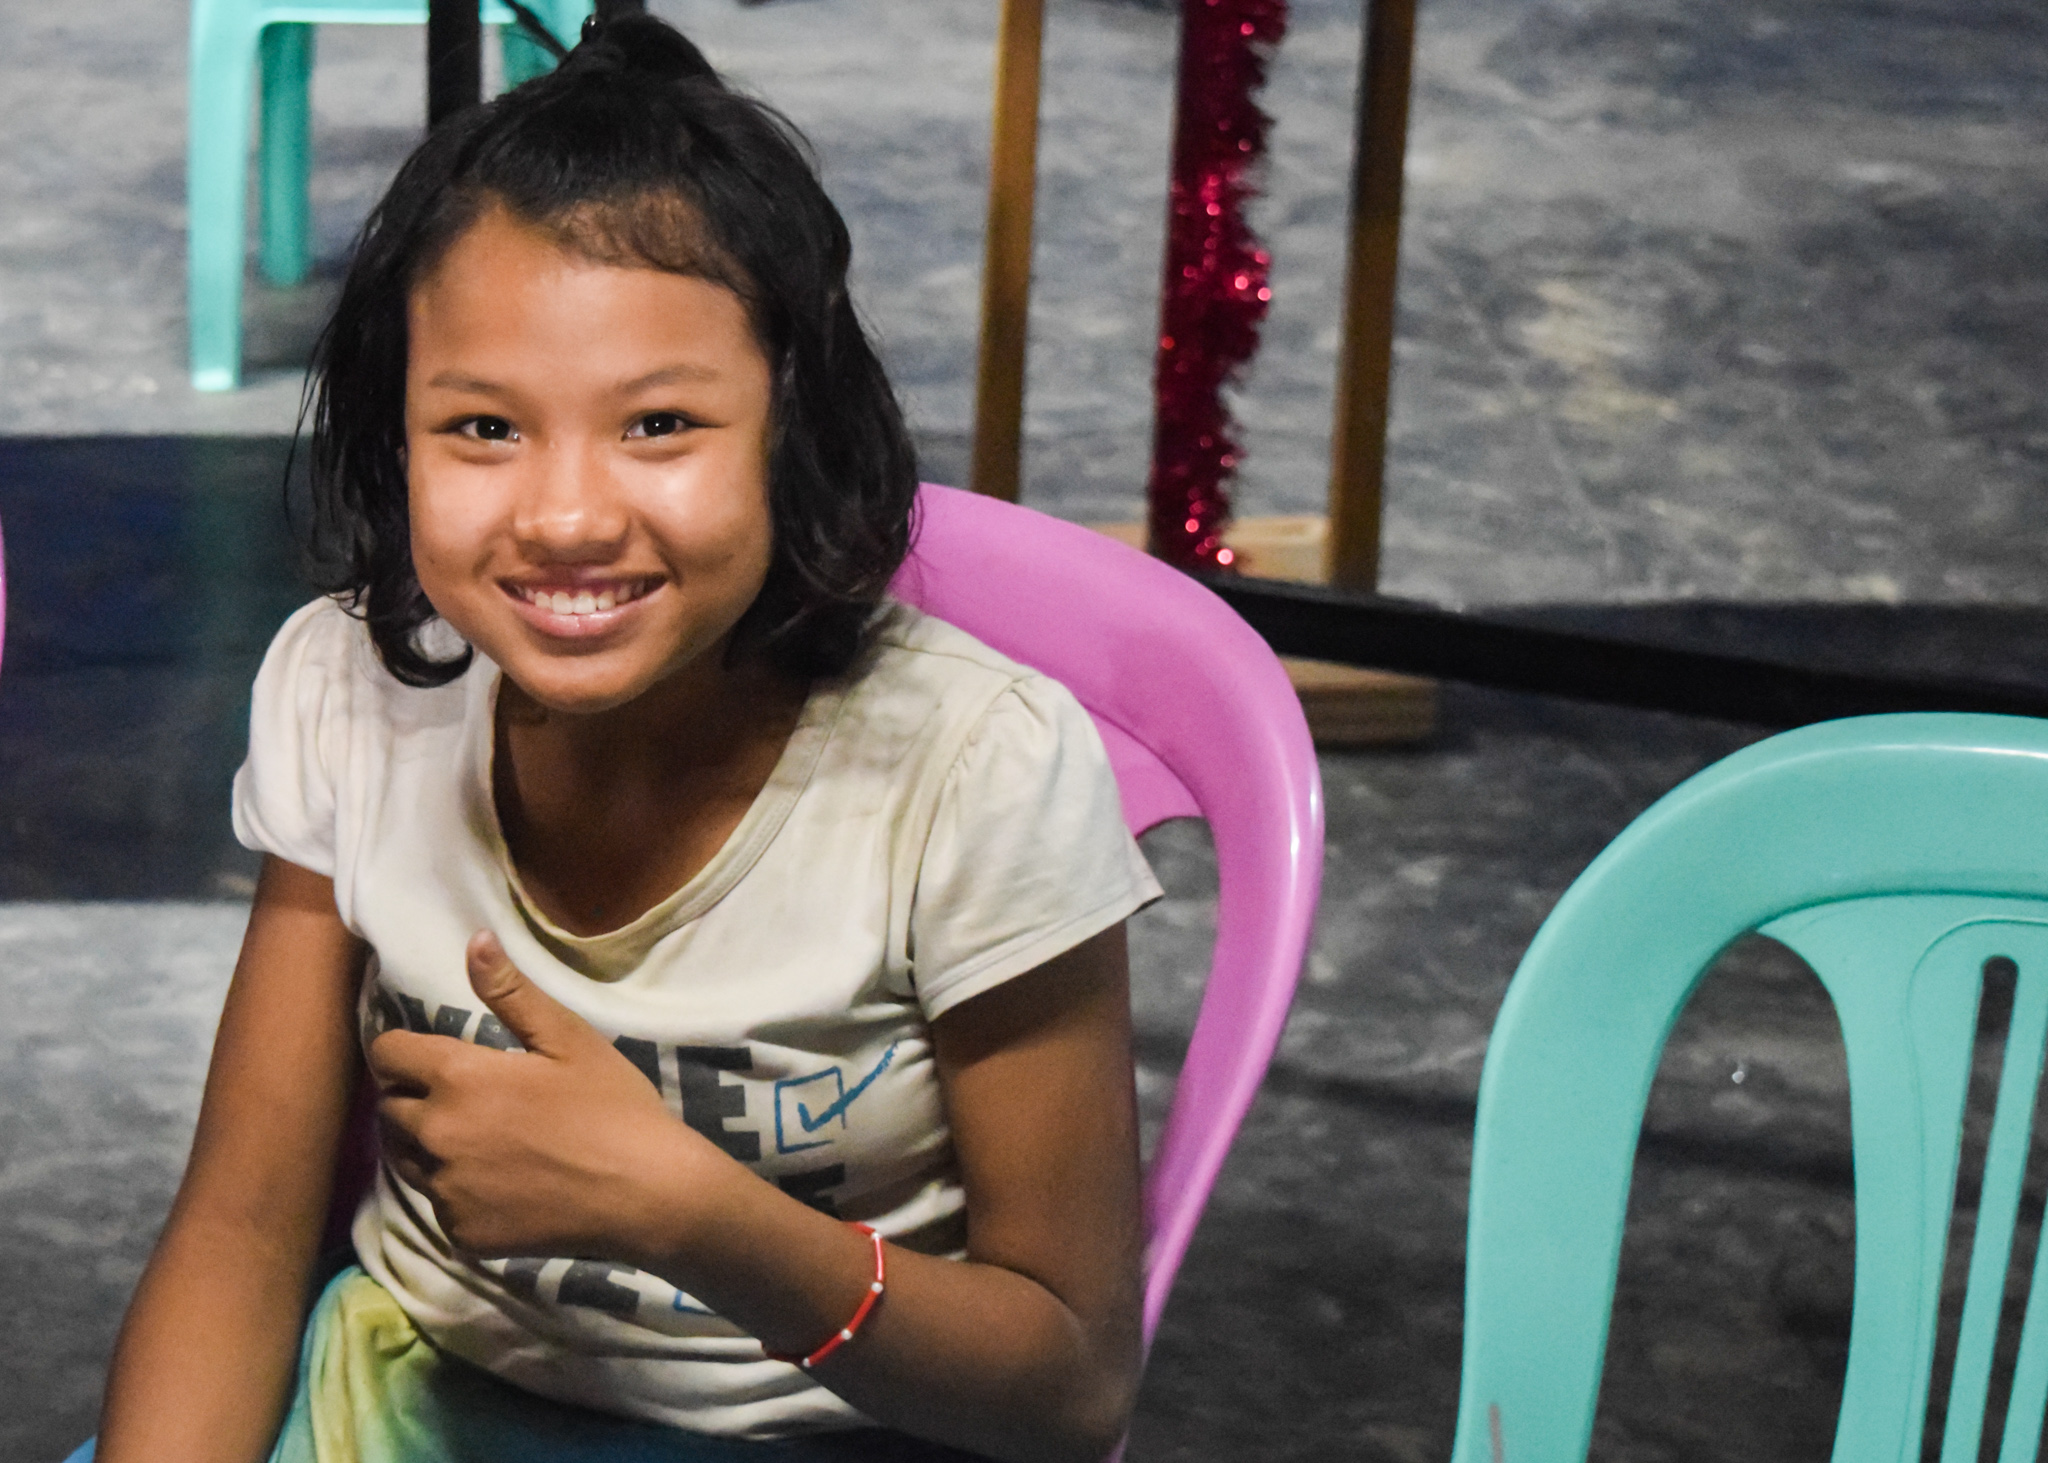 AMG sends help as Myanmar violence continues